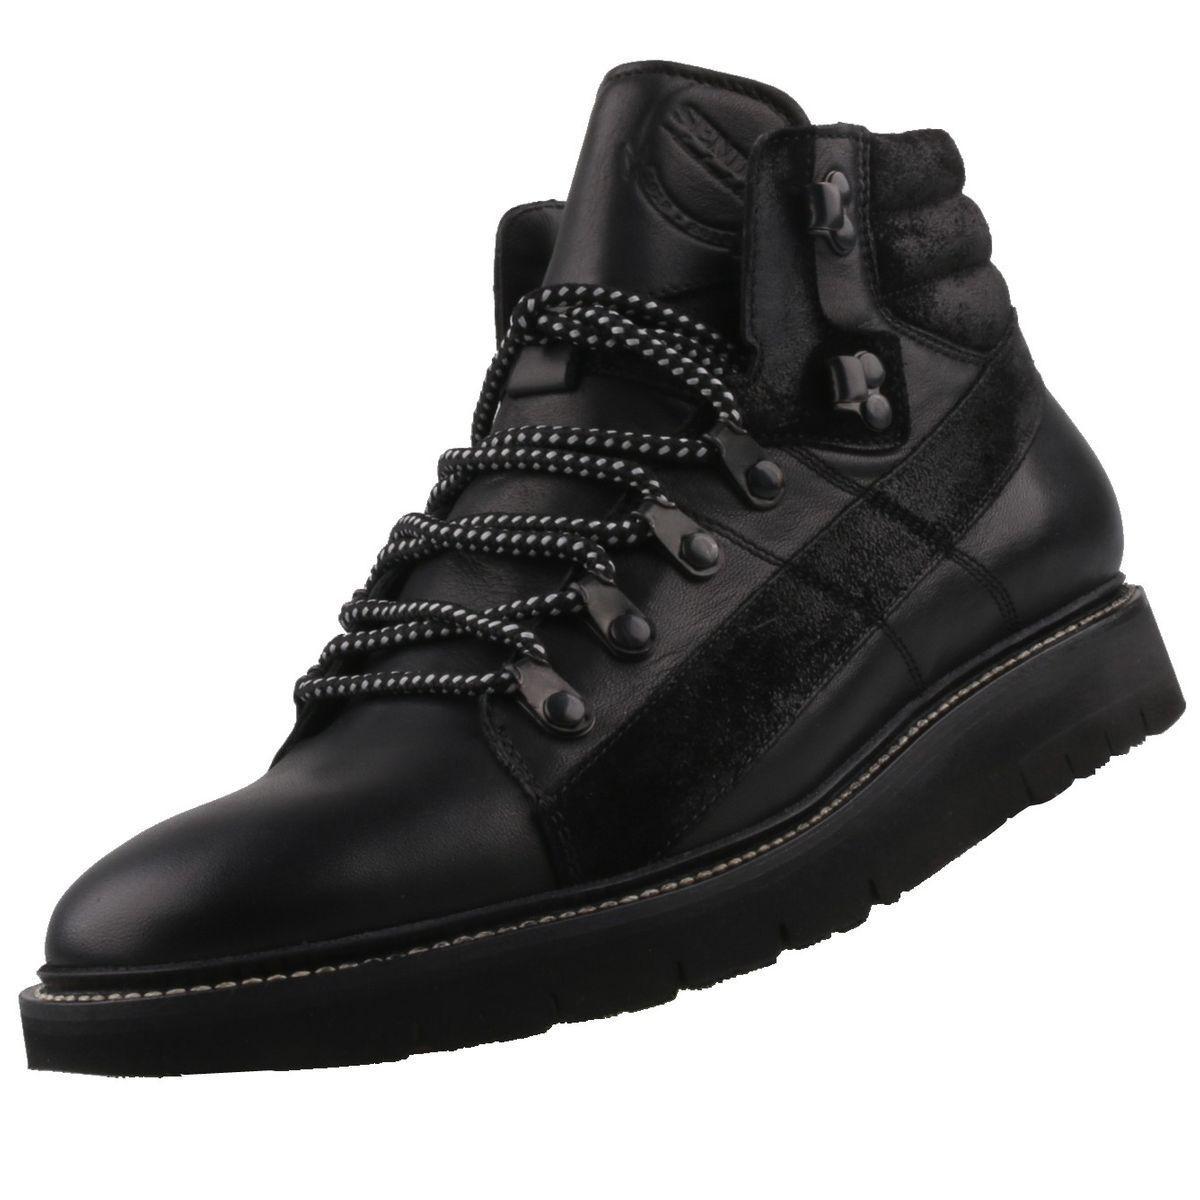 Neu SENDRA Stiefel Herrenschuhe Herren-Stiefel Stiefeletten Lederstiefel Schuhe